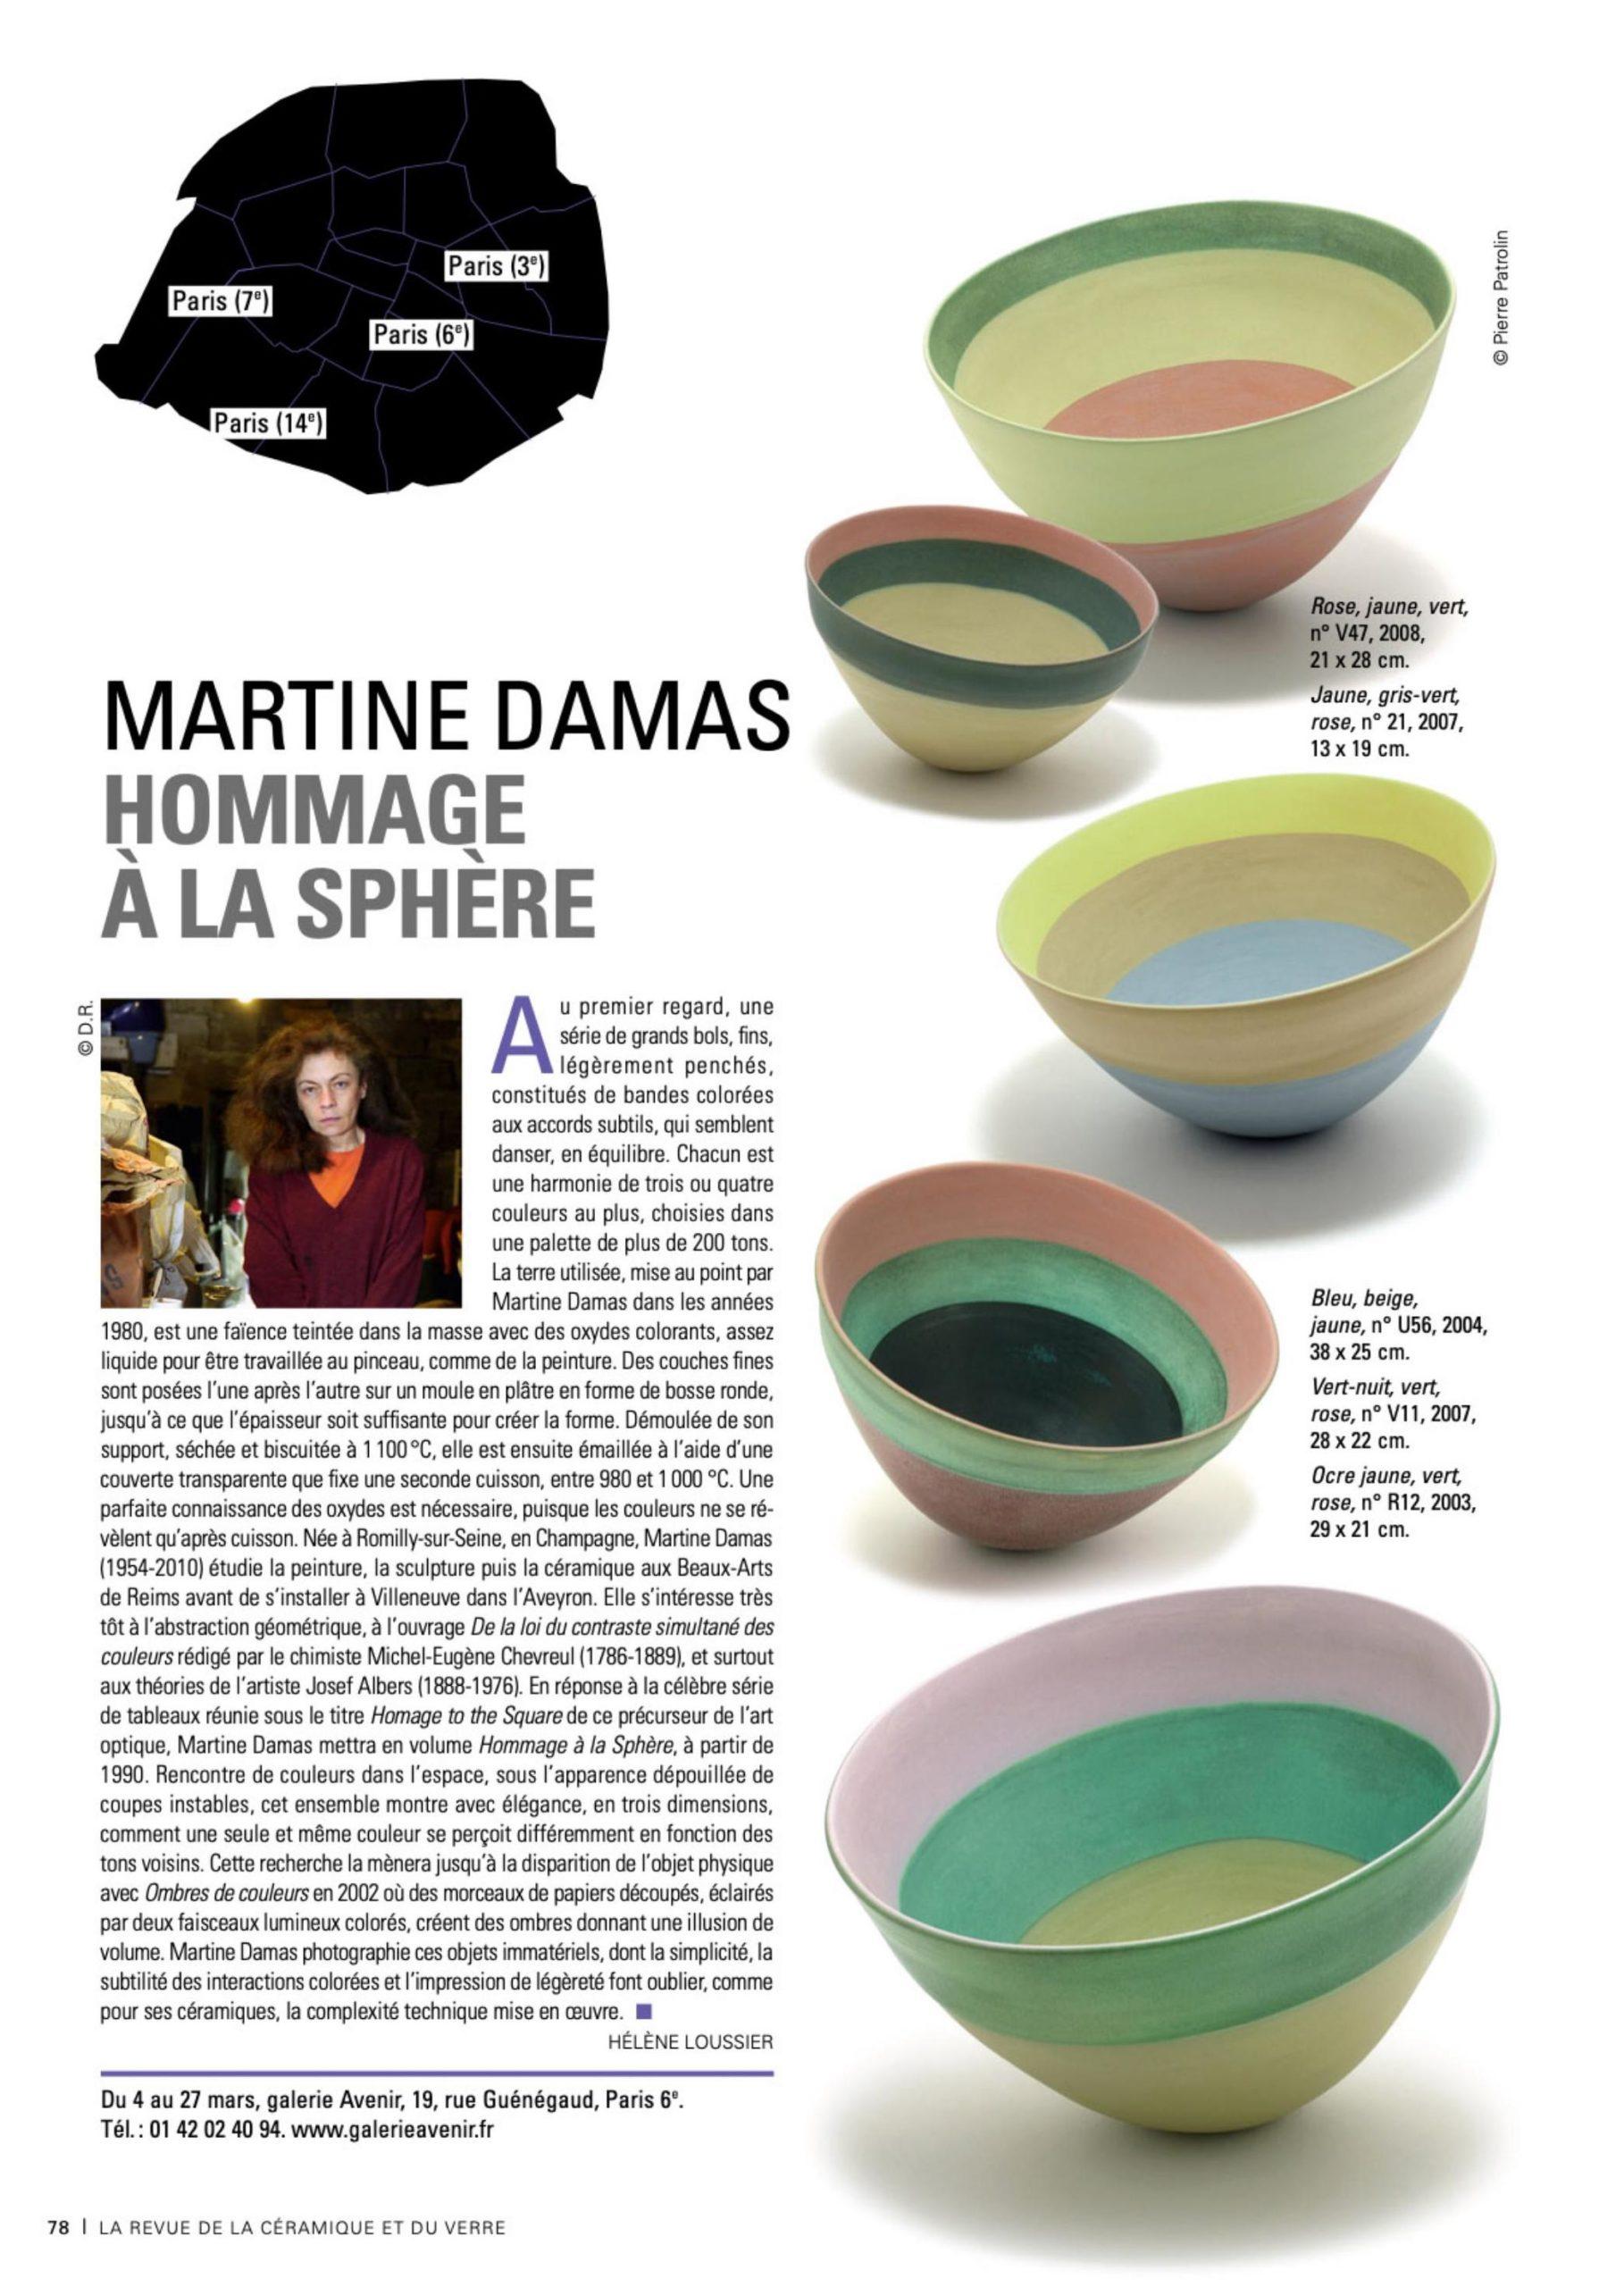 RCV-p.78-article-expo-Martine-Damas